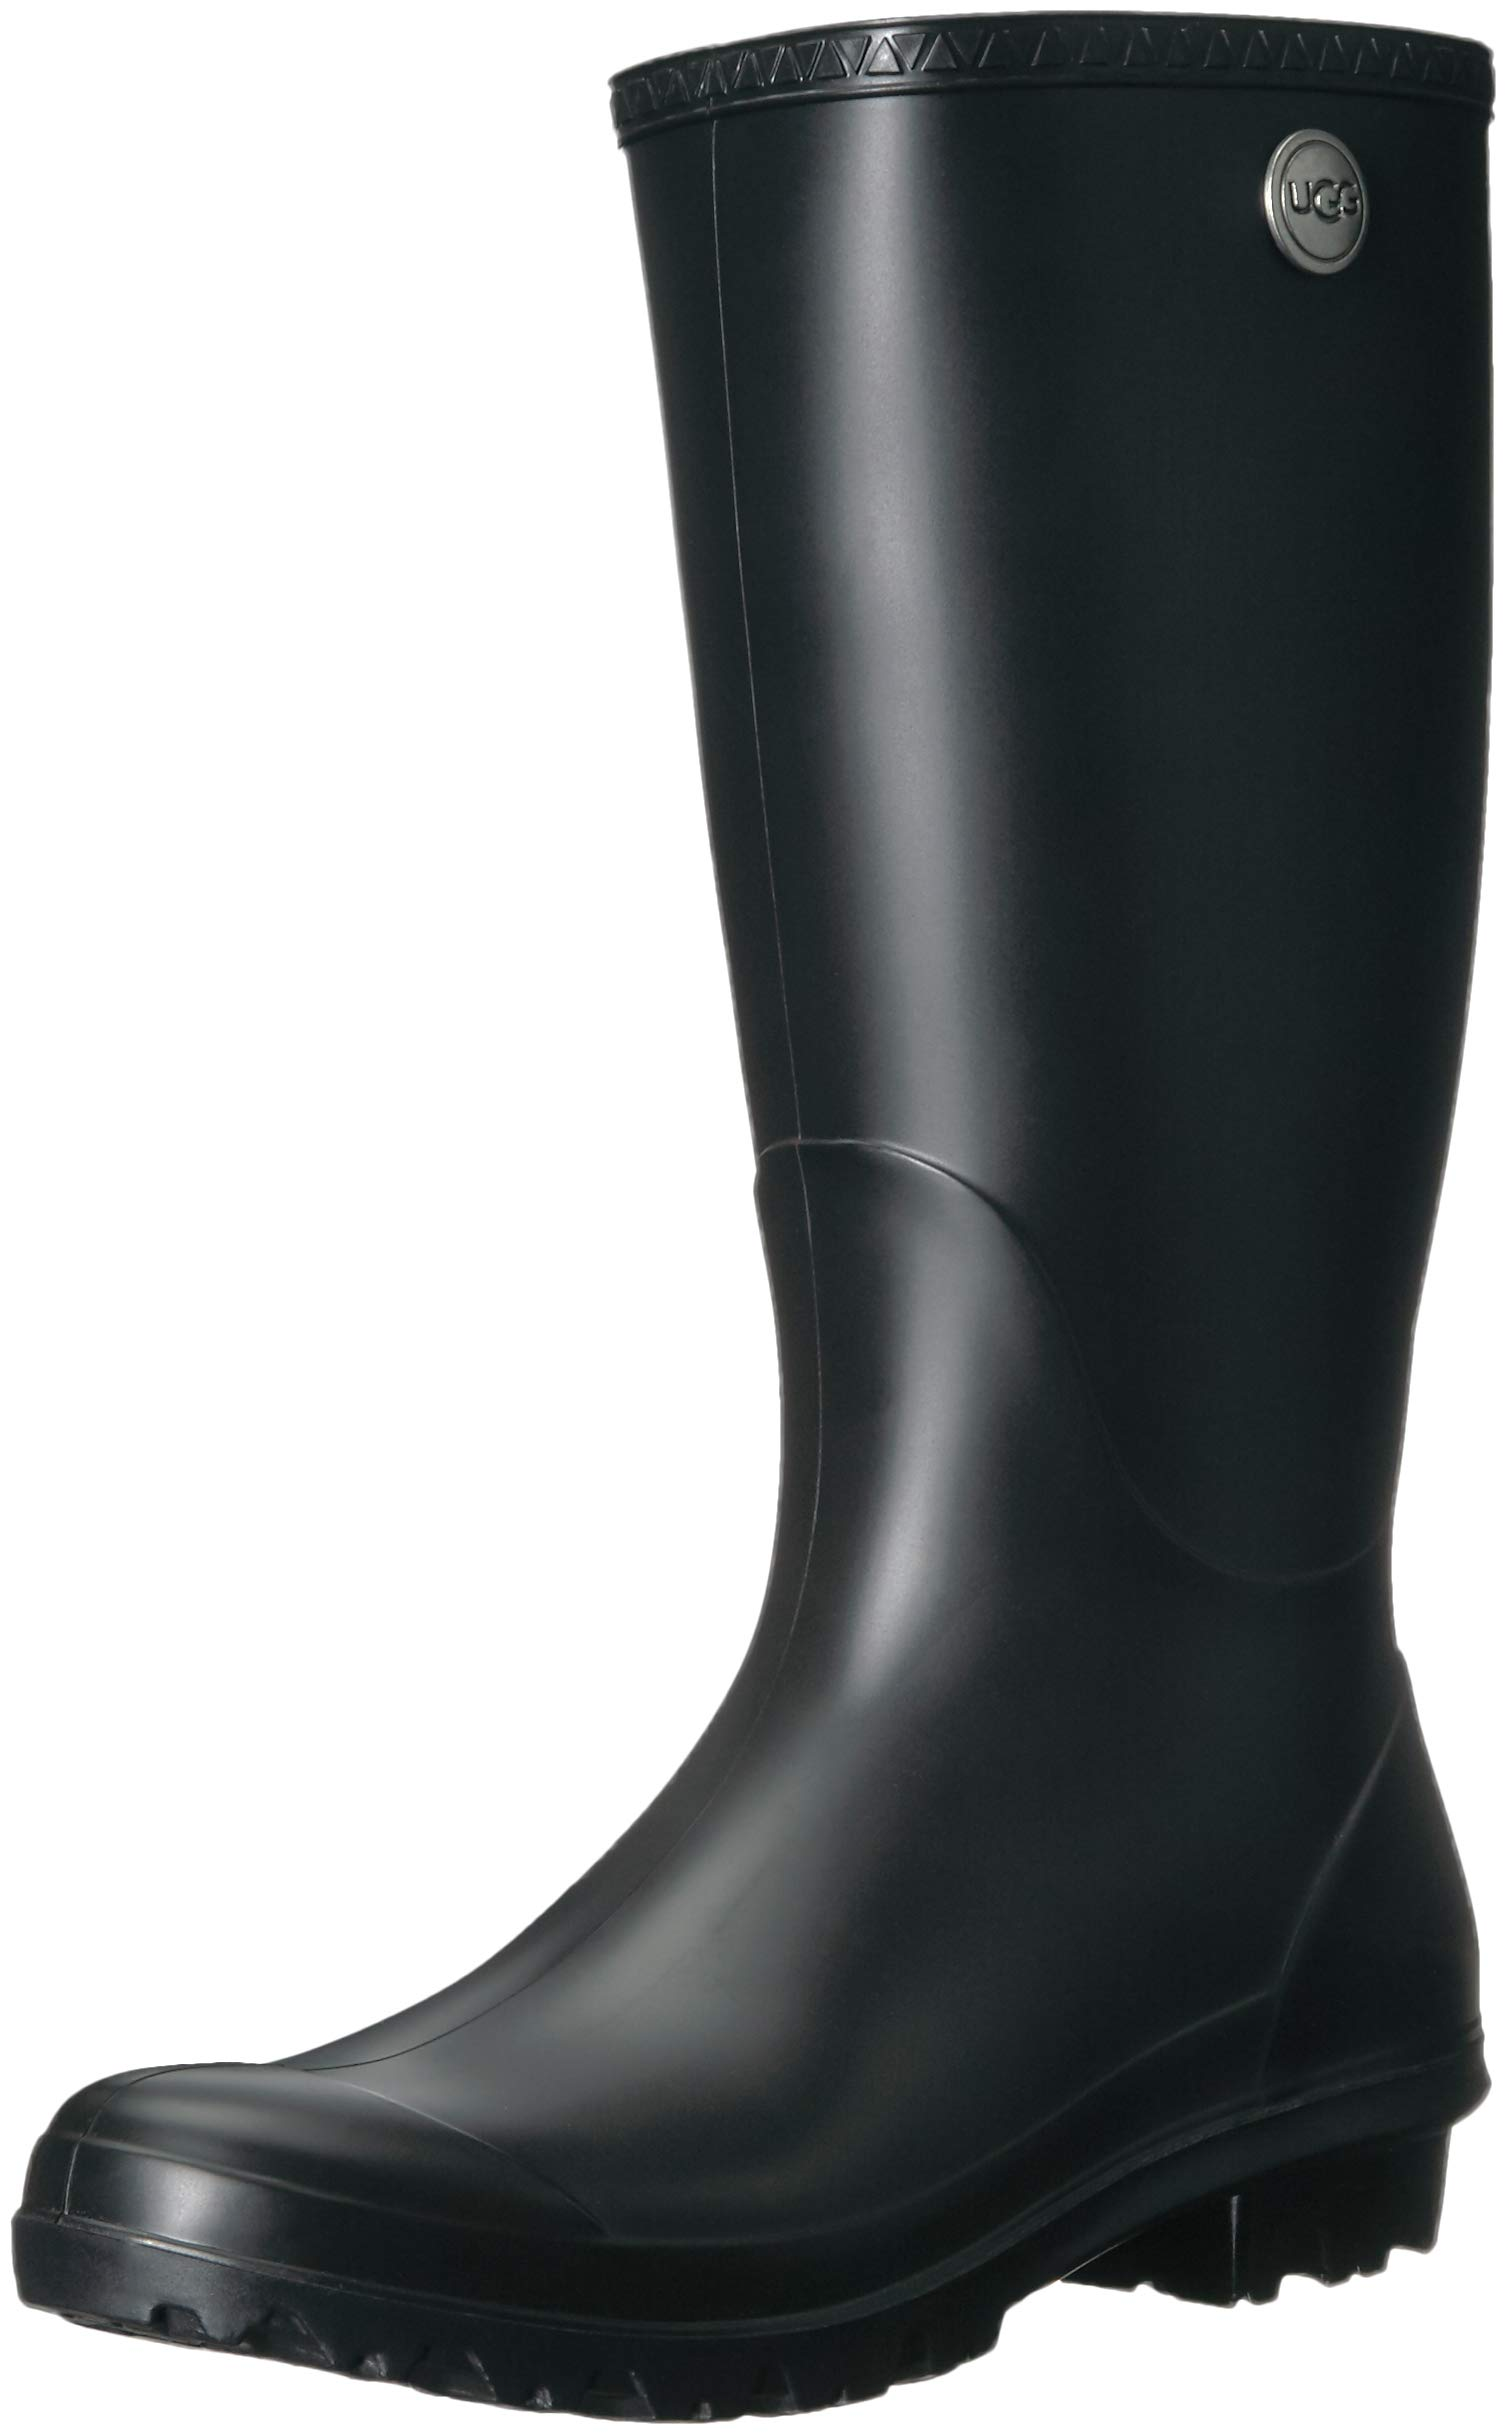 UGG Women's Shelby Matte Rain Boot, Black, 8 M US by UGG